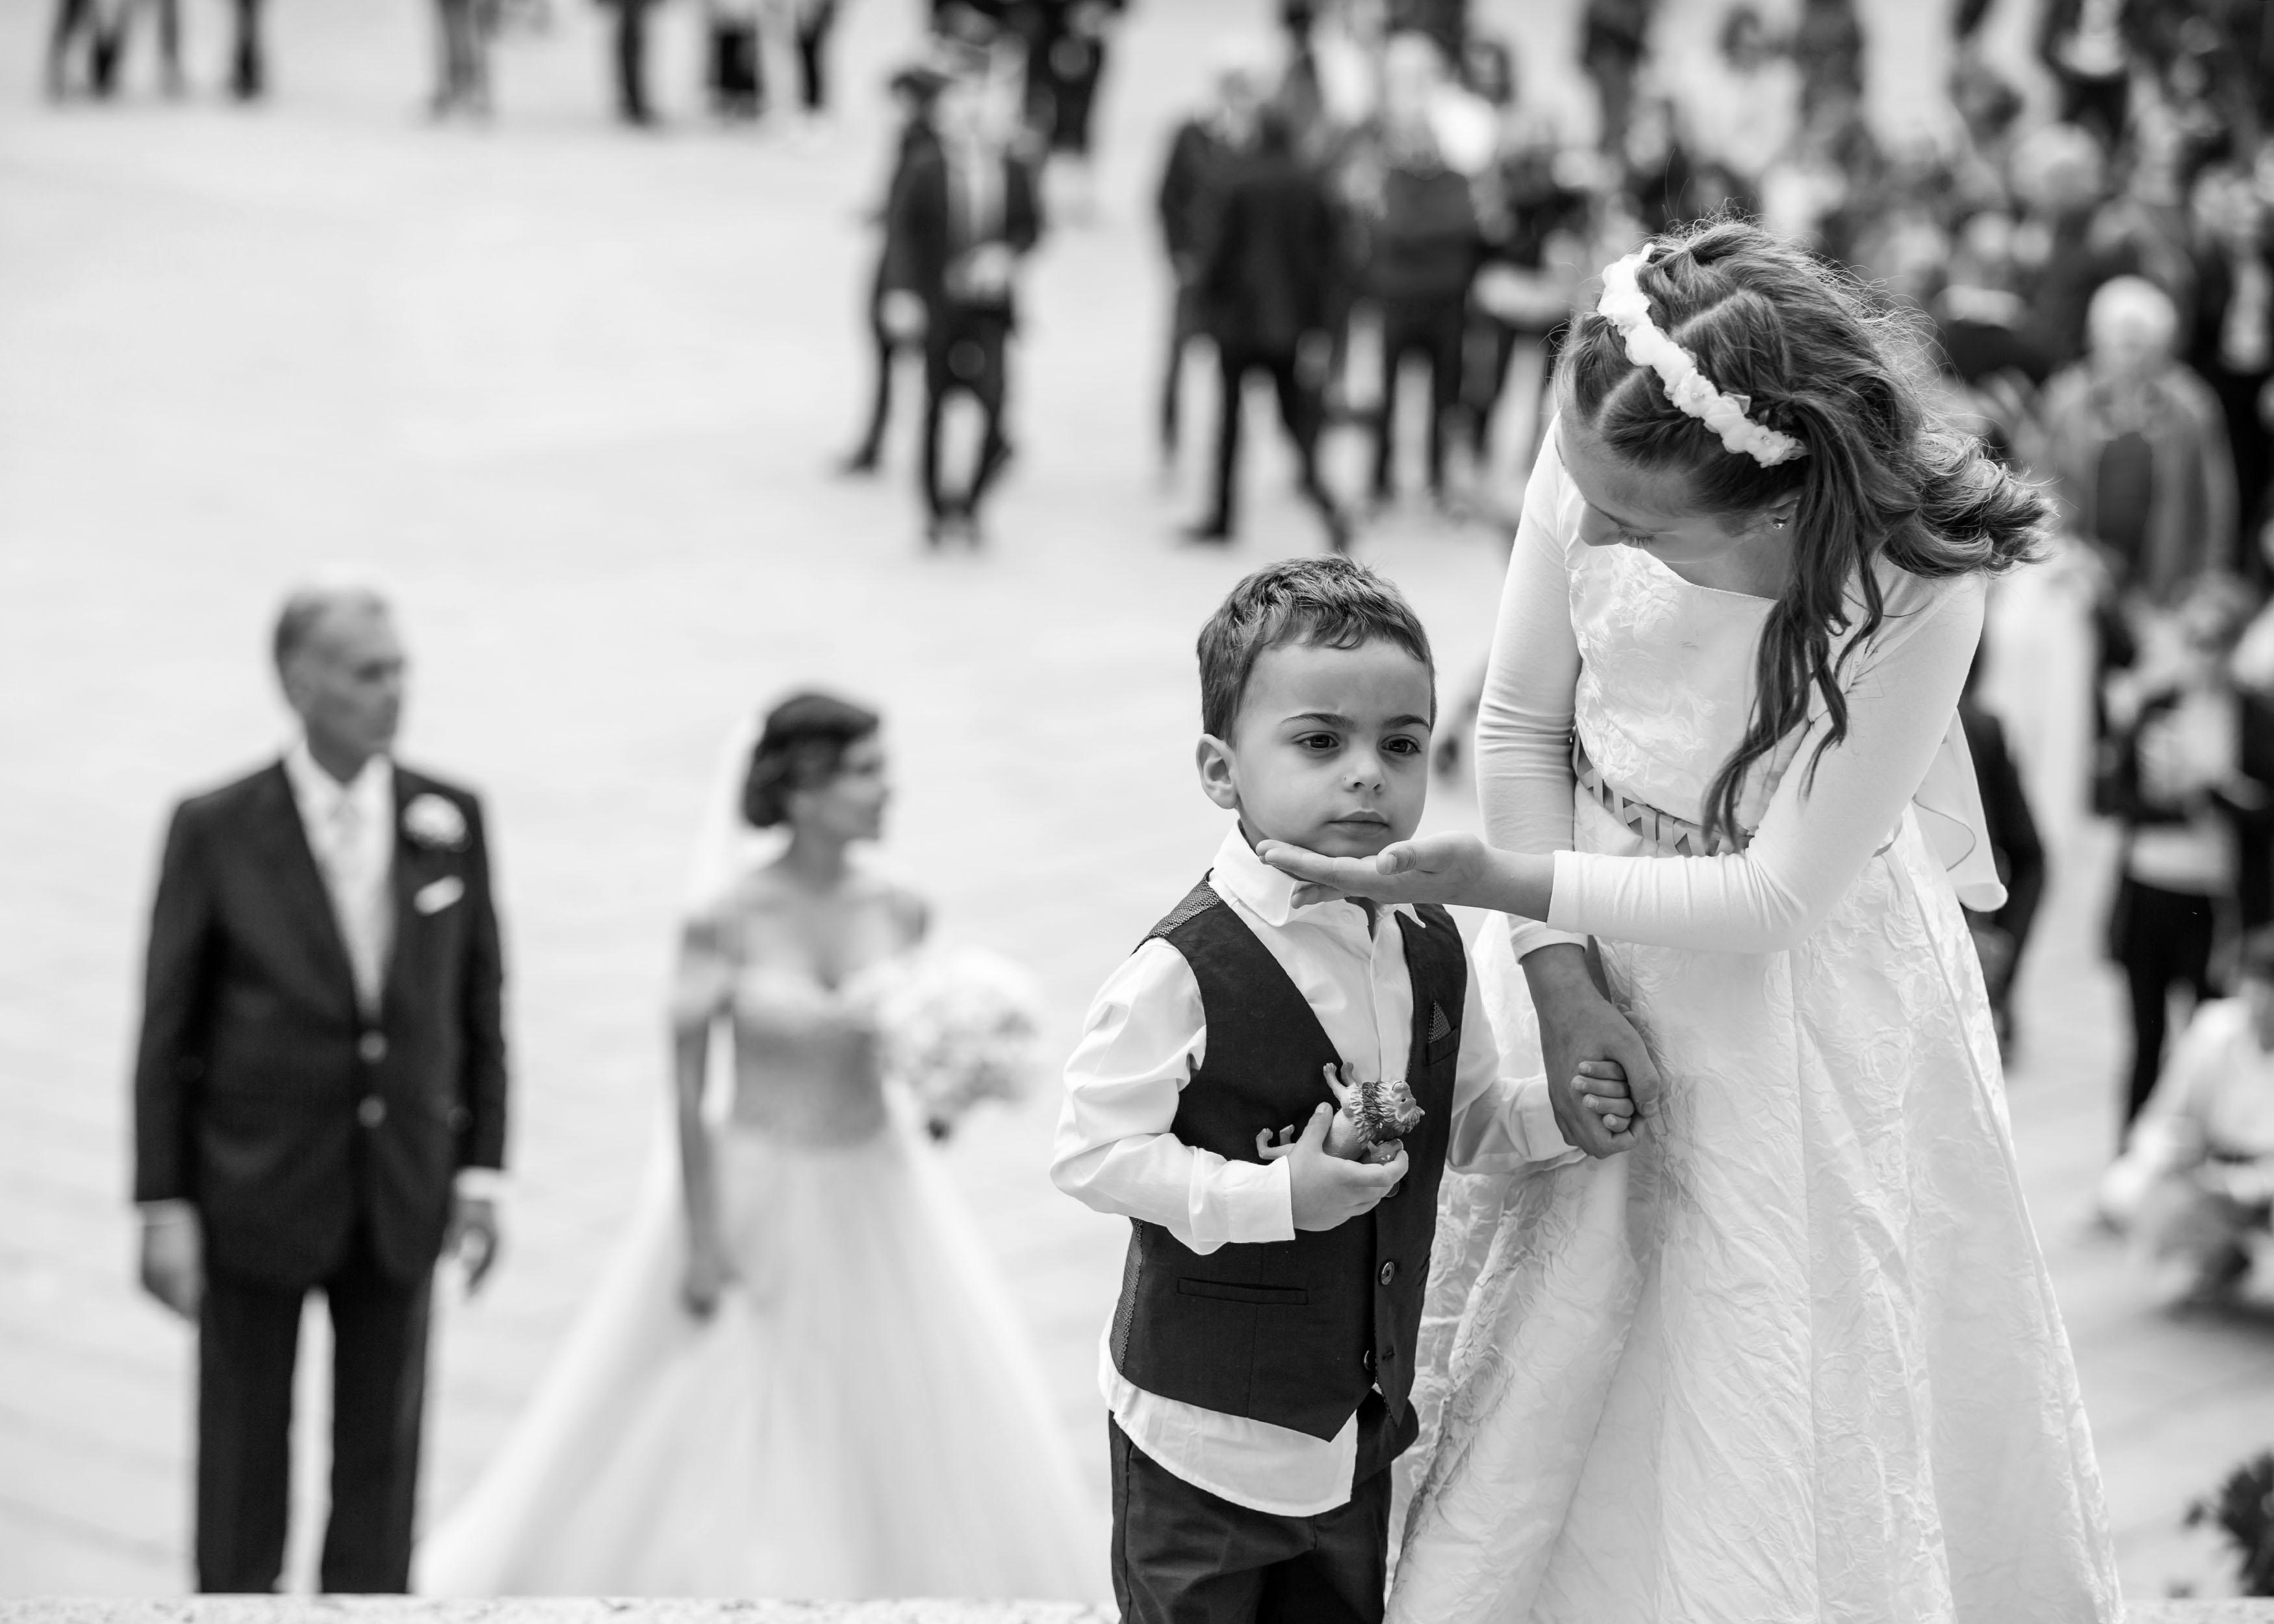 http://www.weddingamalfi.com/wp-content/uploads/Katia-Jorge-18-maggio-2019-23.jpg